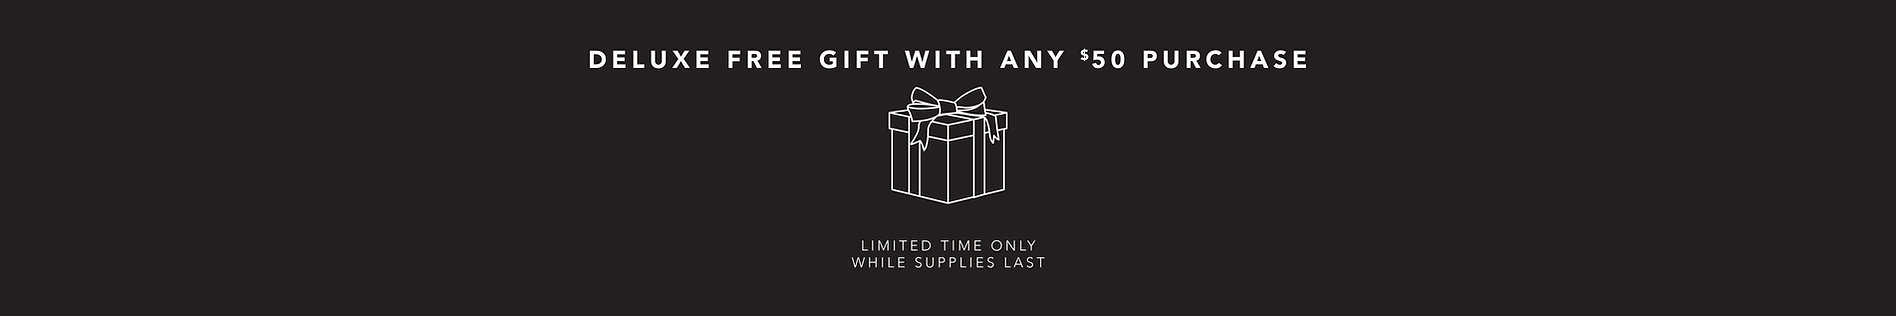 free gift.jpg